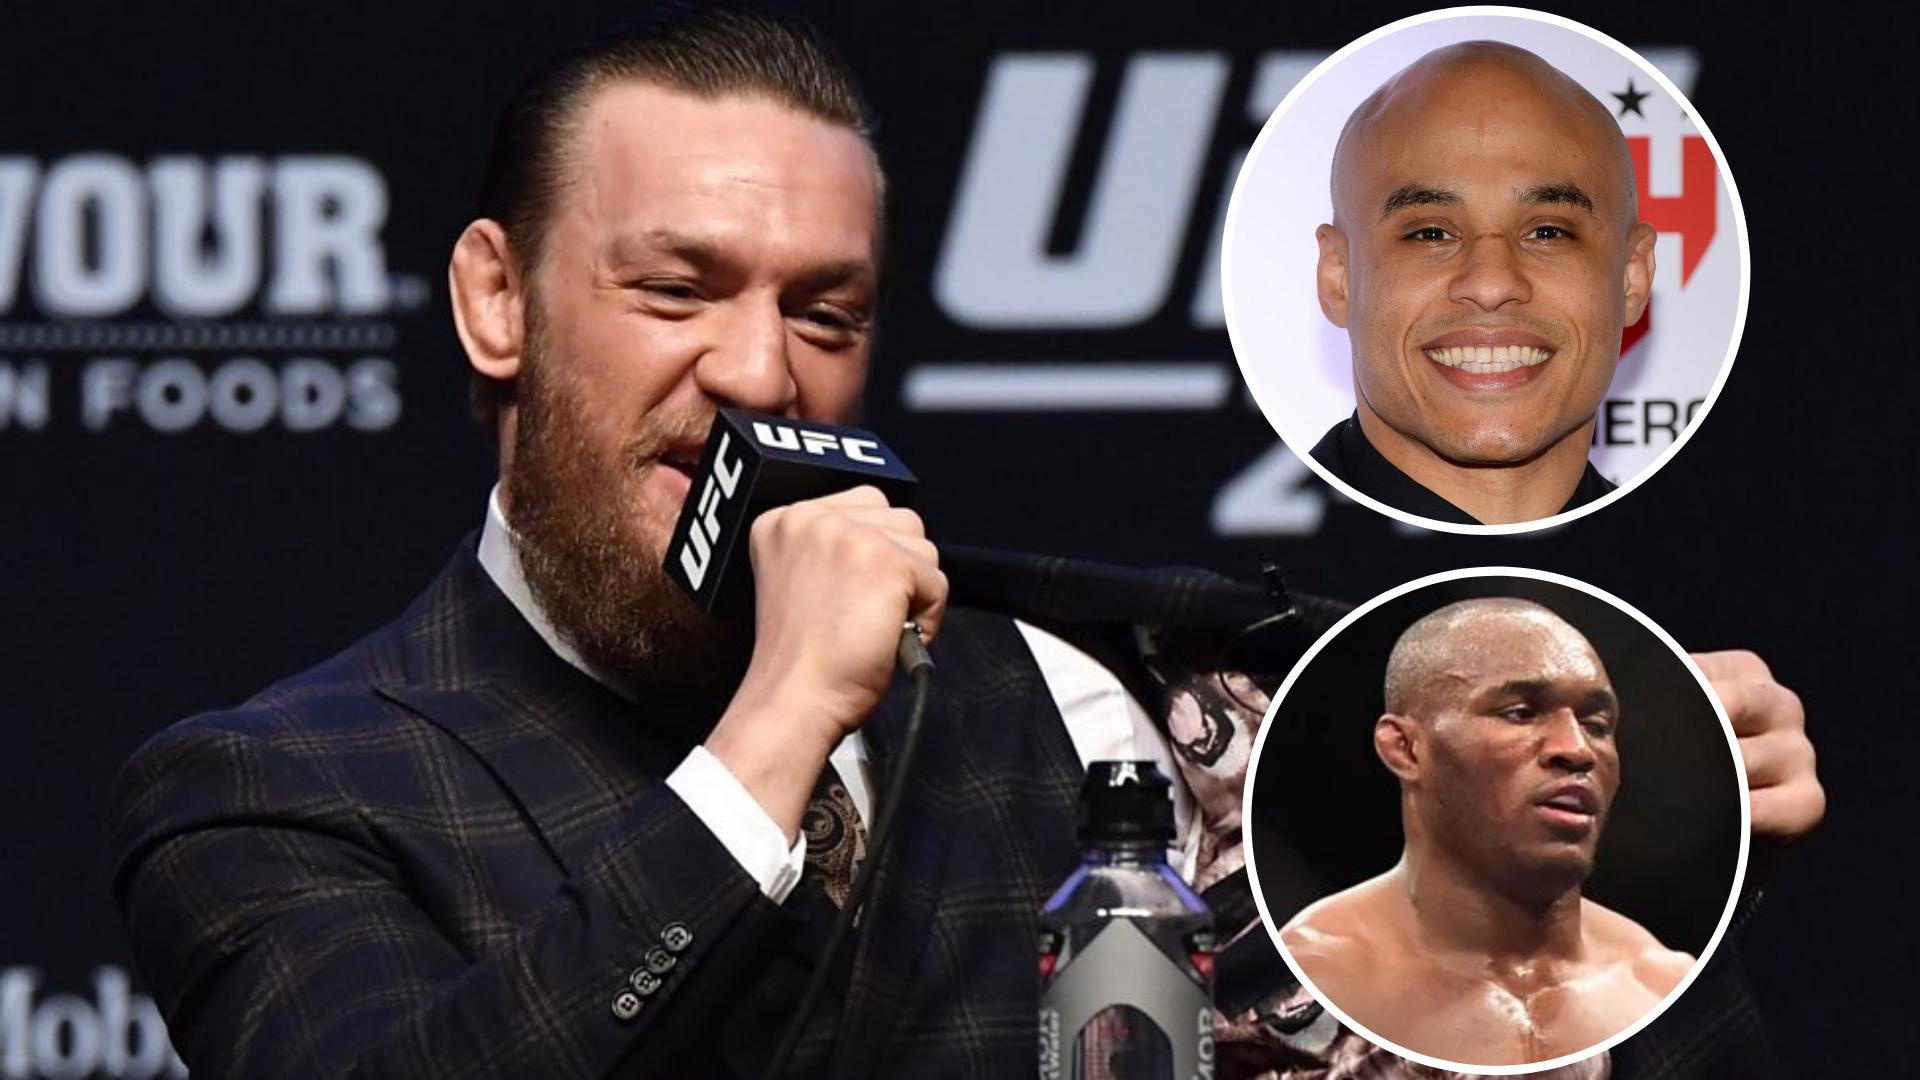 Conor McGregor accuses Ali Abdelaziz of tweeting using Kamaru Usman's account - Kamaru